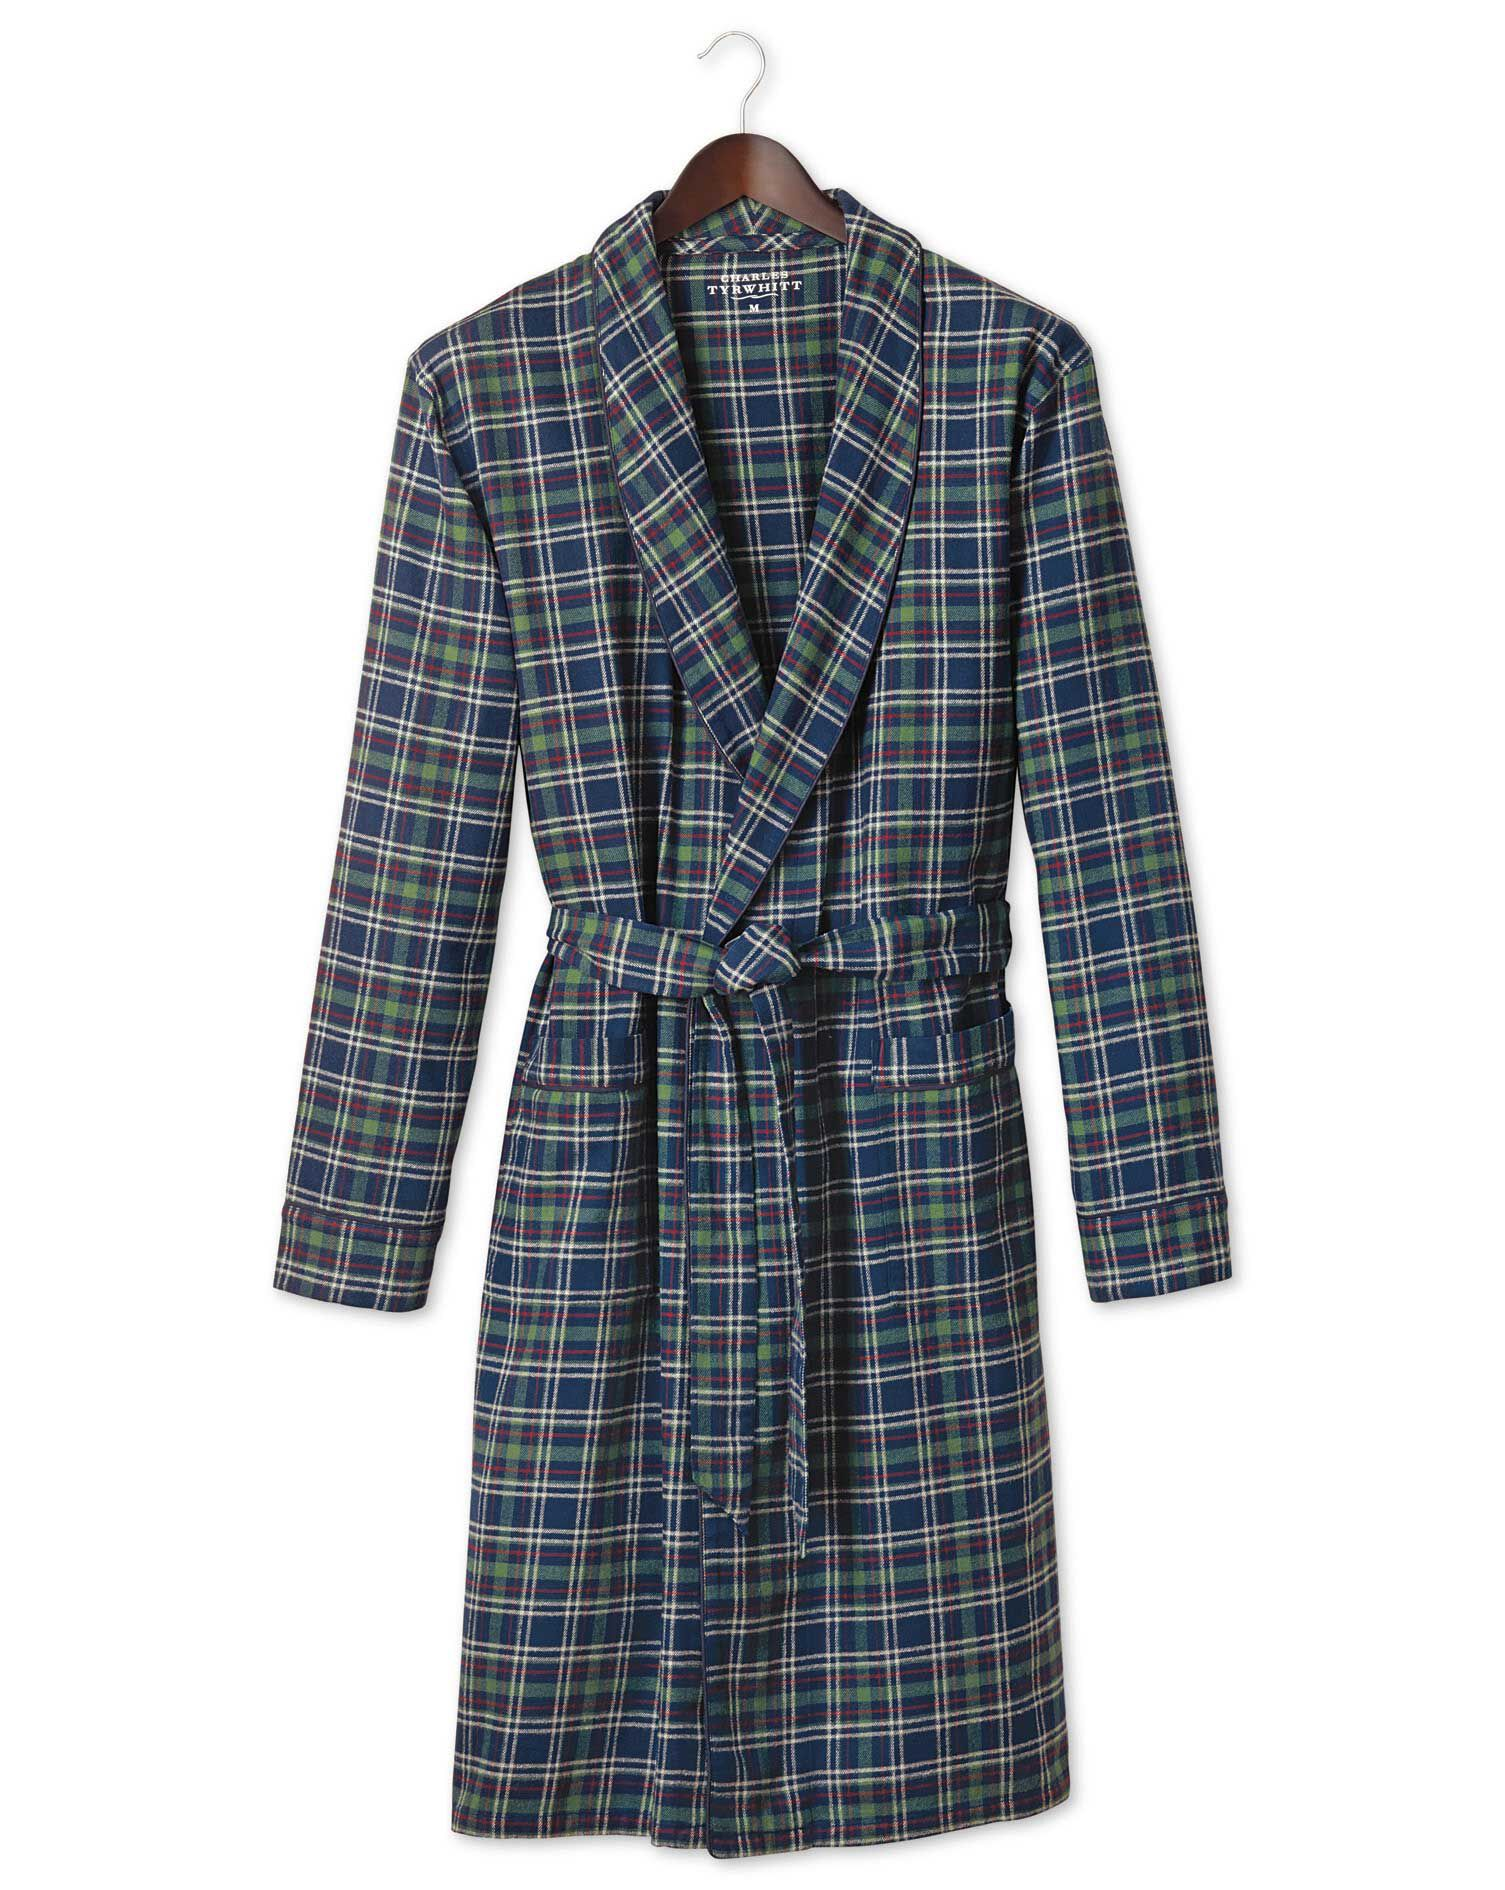 Navy Check Cotton Robe Size XS by Charles Tyrwhitt